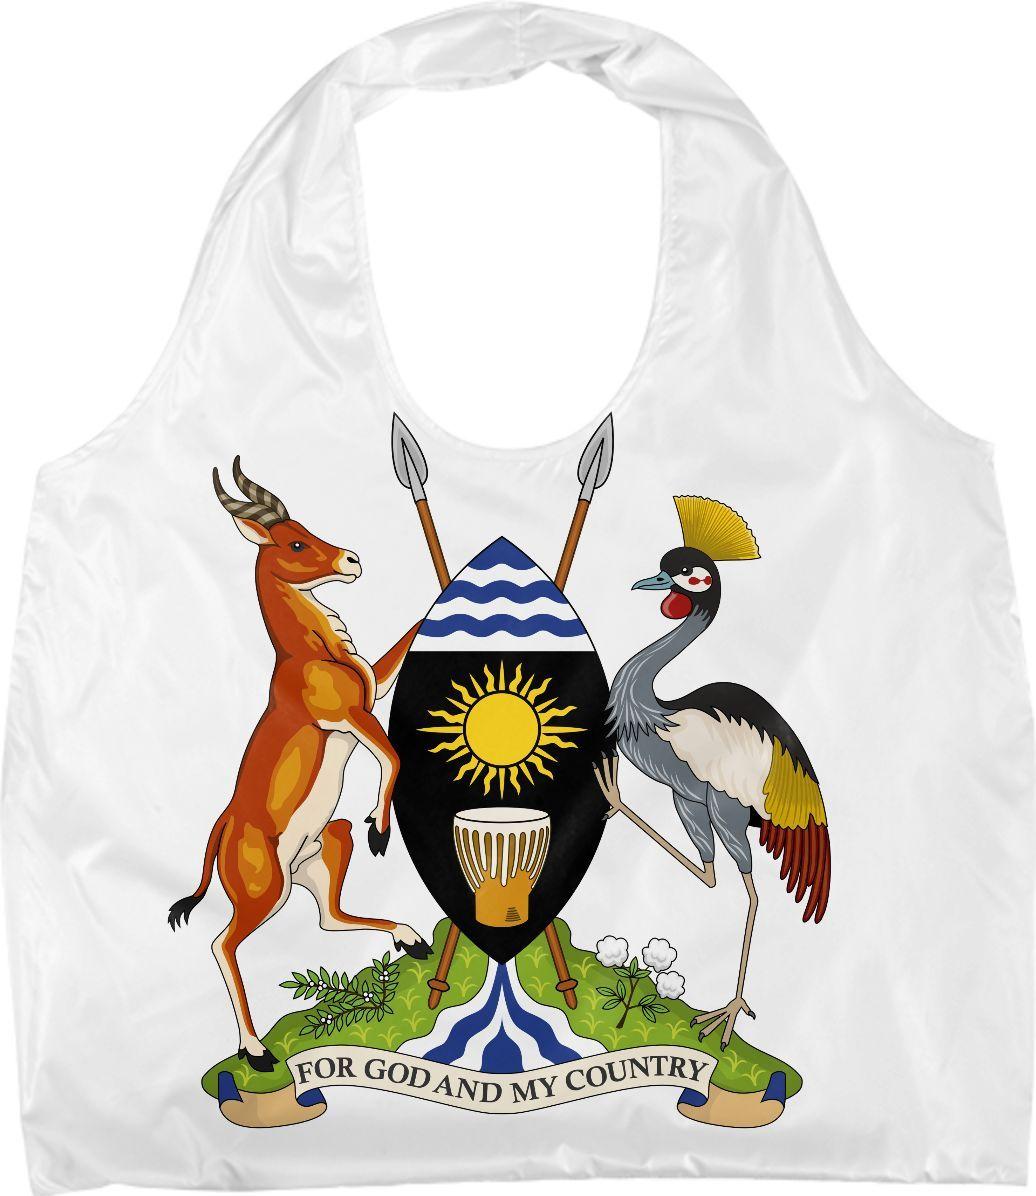 P Republic Of Uganda